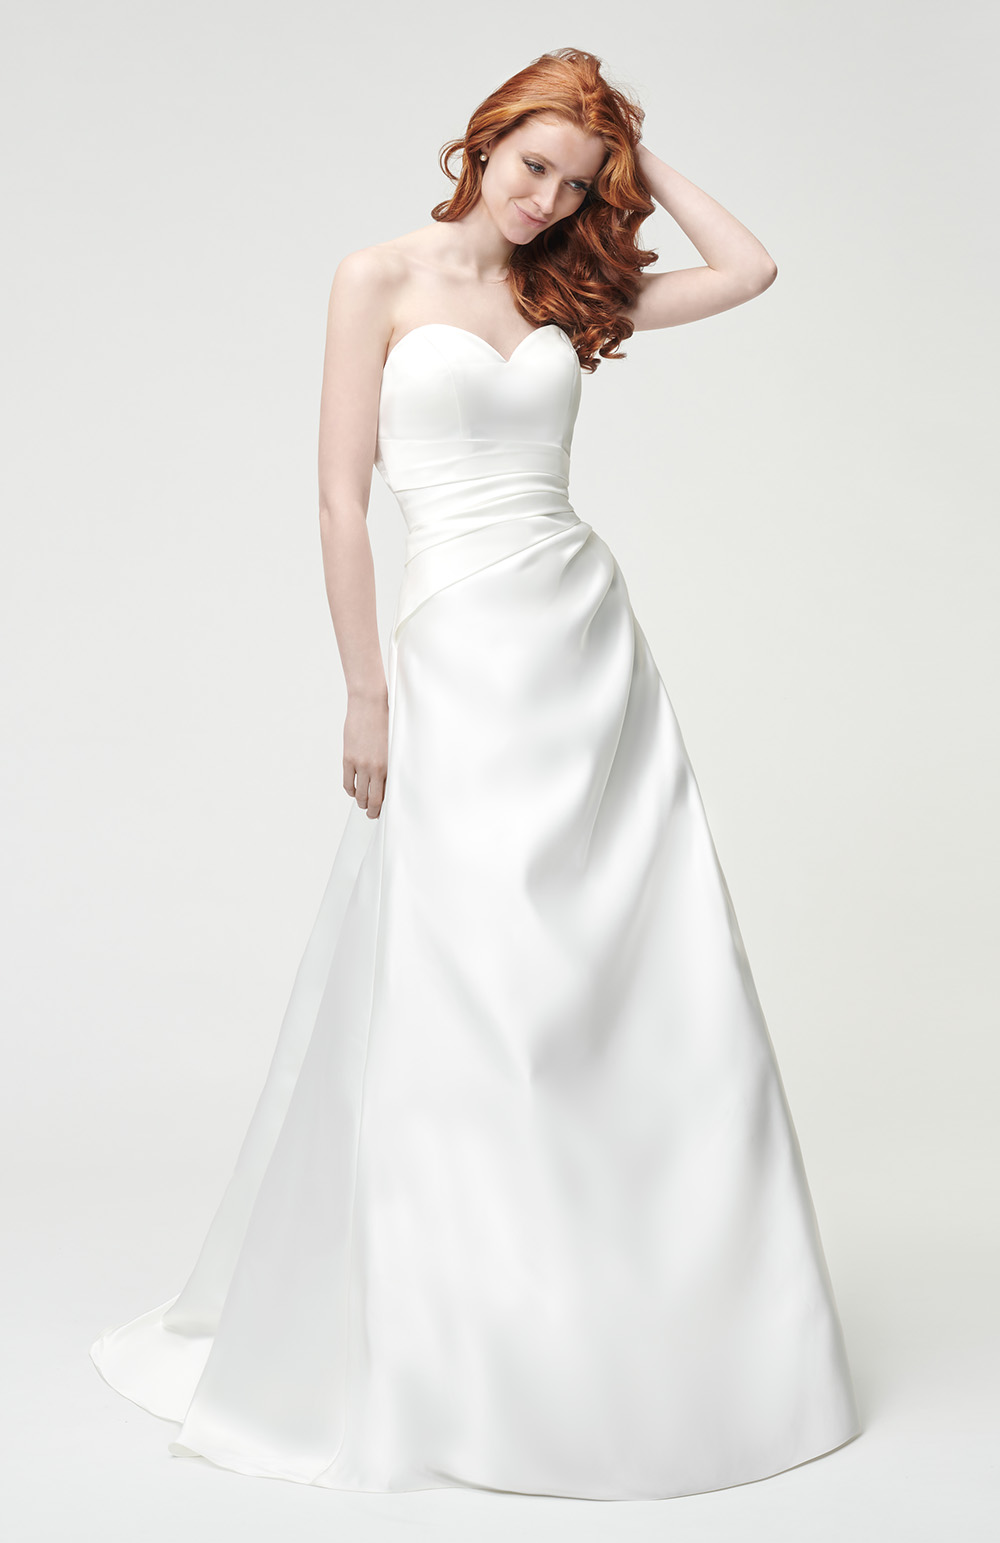 Robe de mariée Modèle Ondine